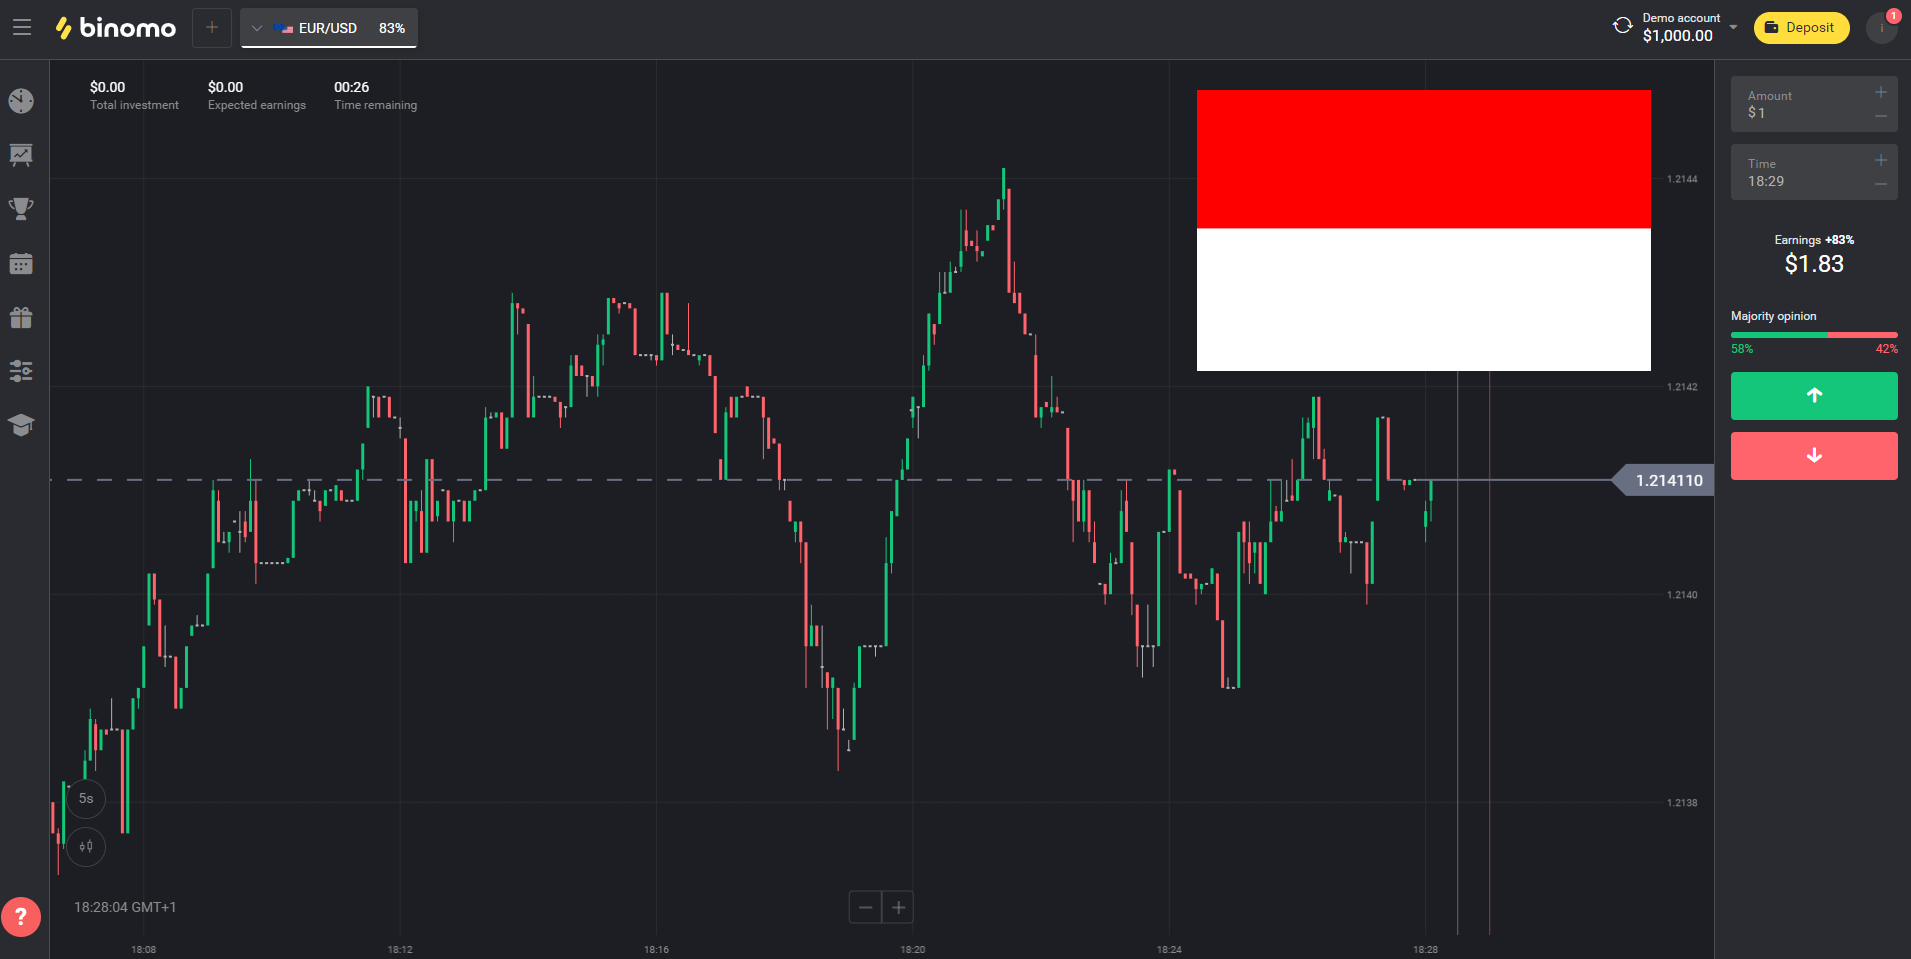 Binomo trading platform in Indonesia